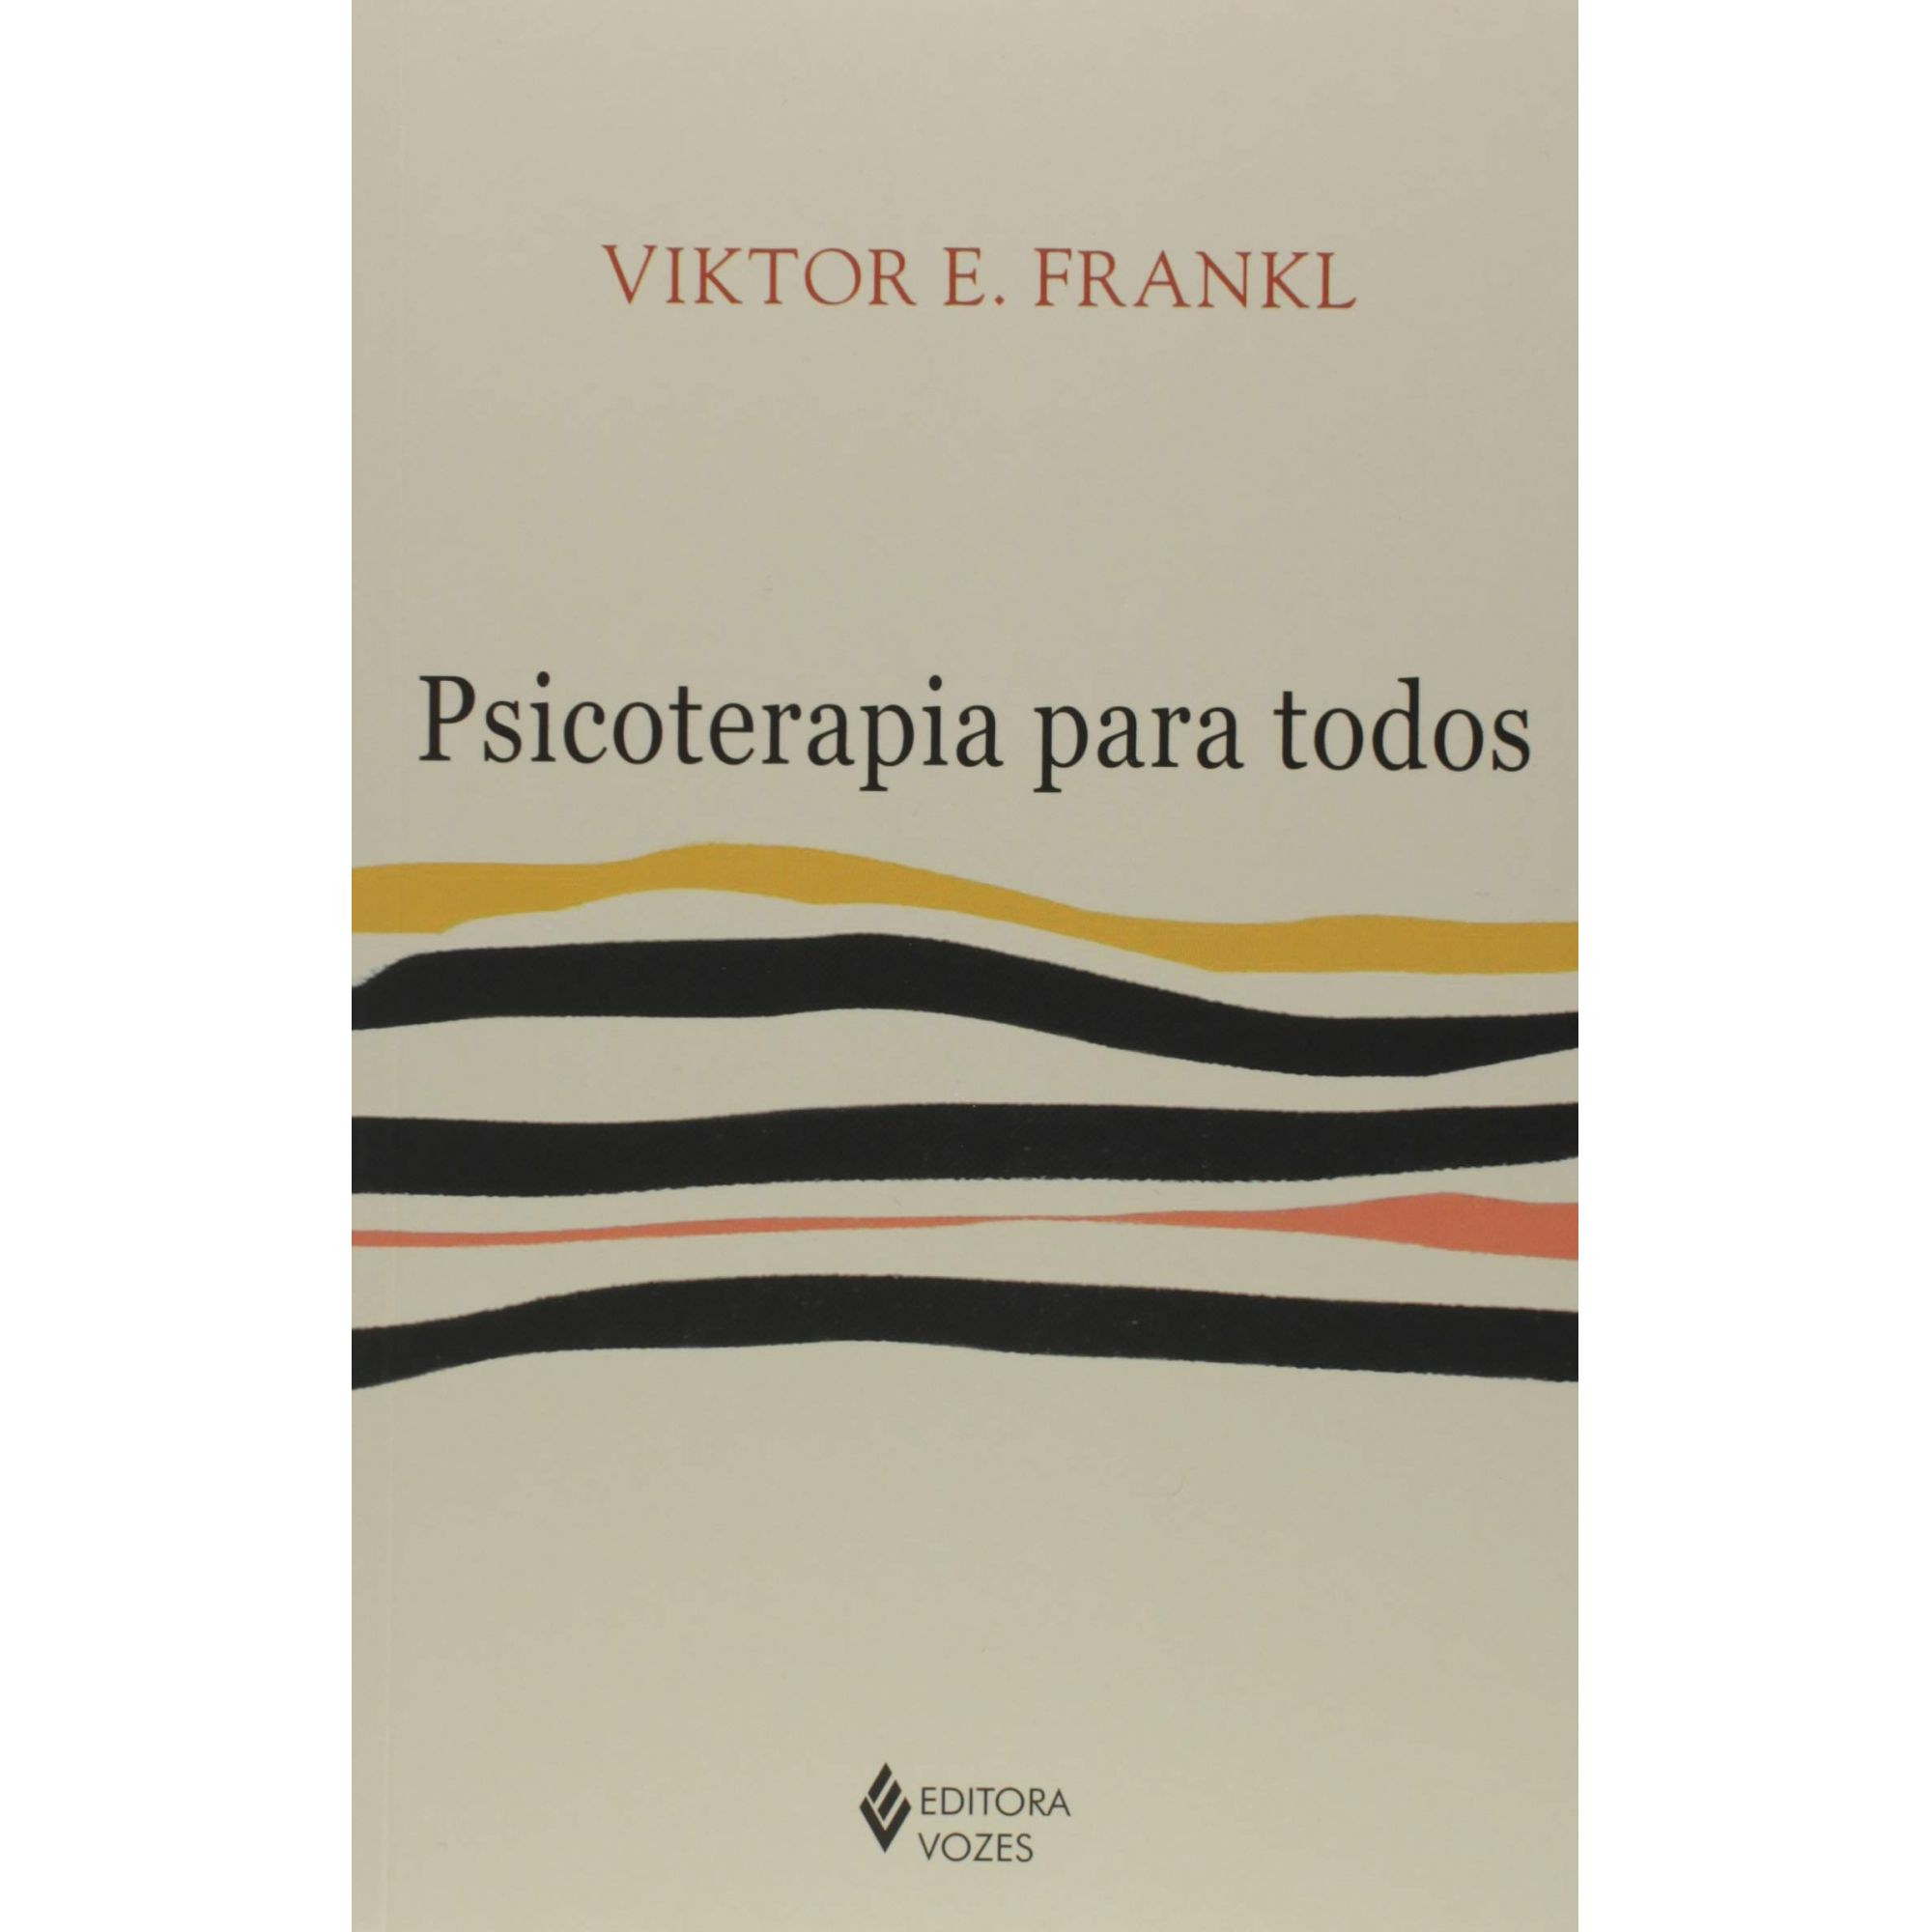 PSICOTERAPIA PARA TODOS